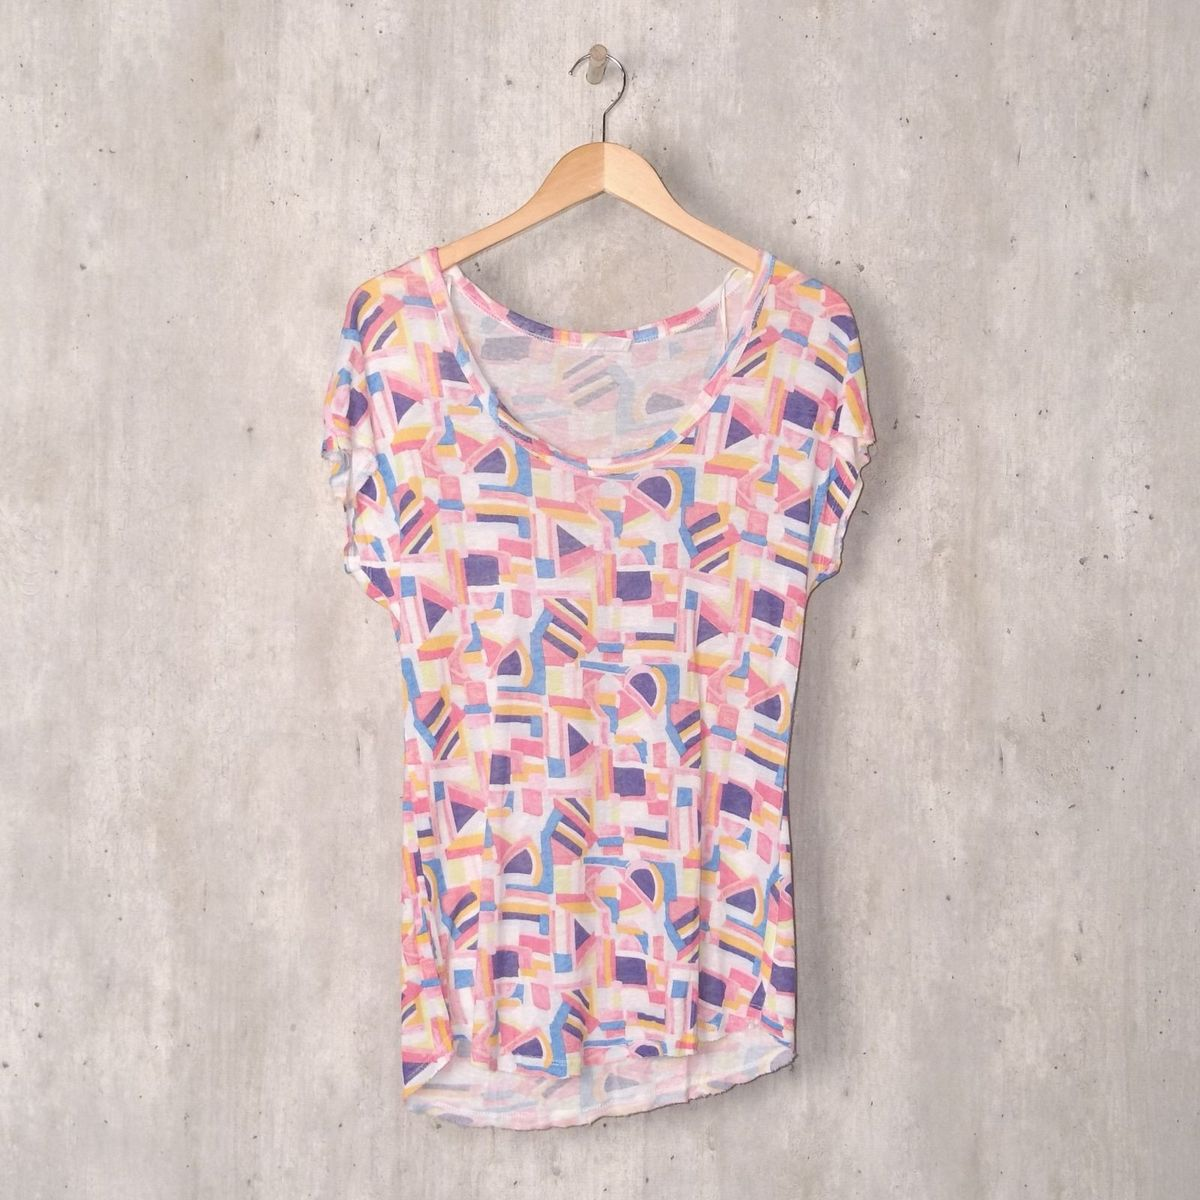 2af3811f6 Blusinha Abstrata Colorida | Blusa Feminina Zara Usado 30405662 | enjoei